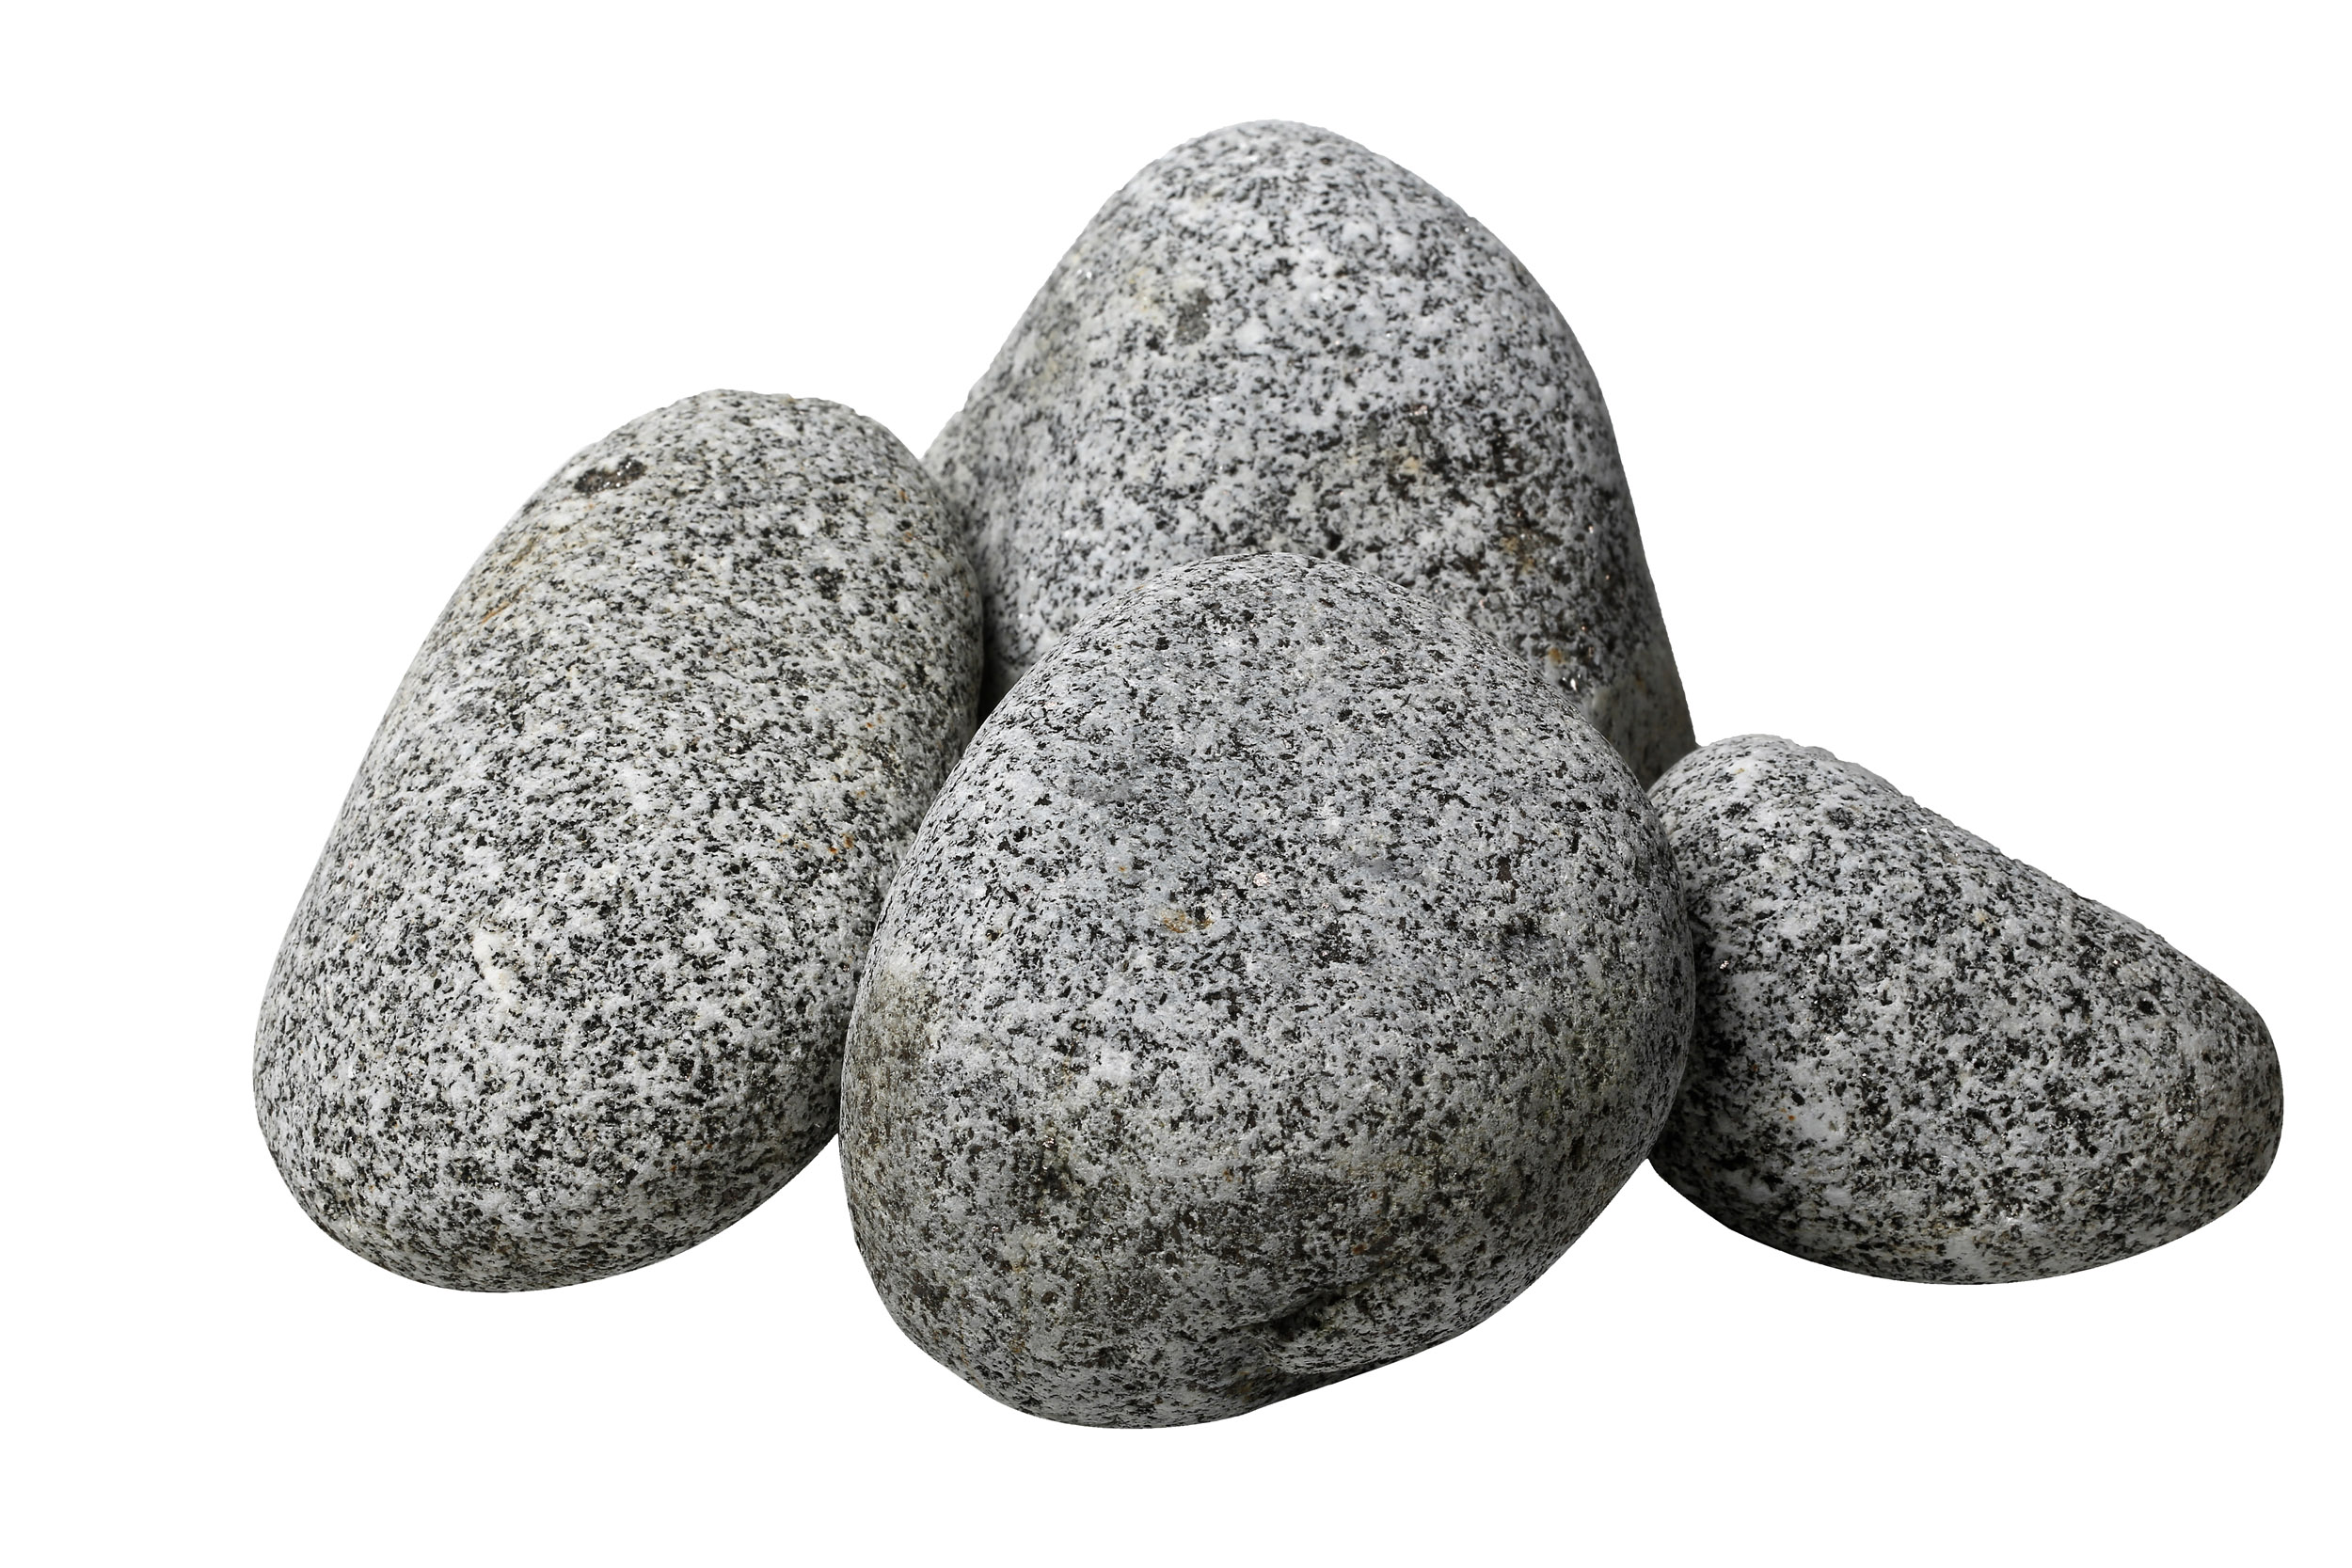 Granit gris adouci - Calibre 100-200